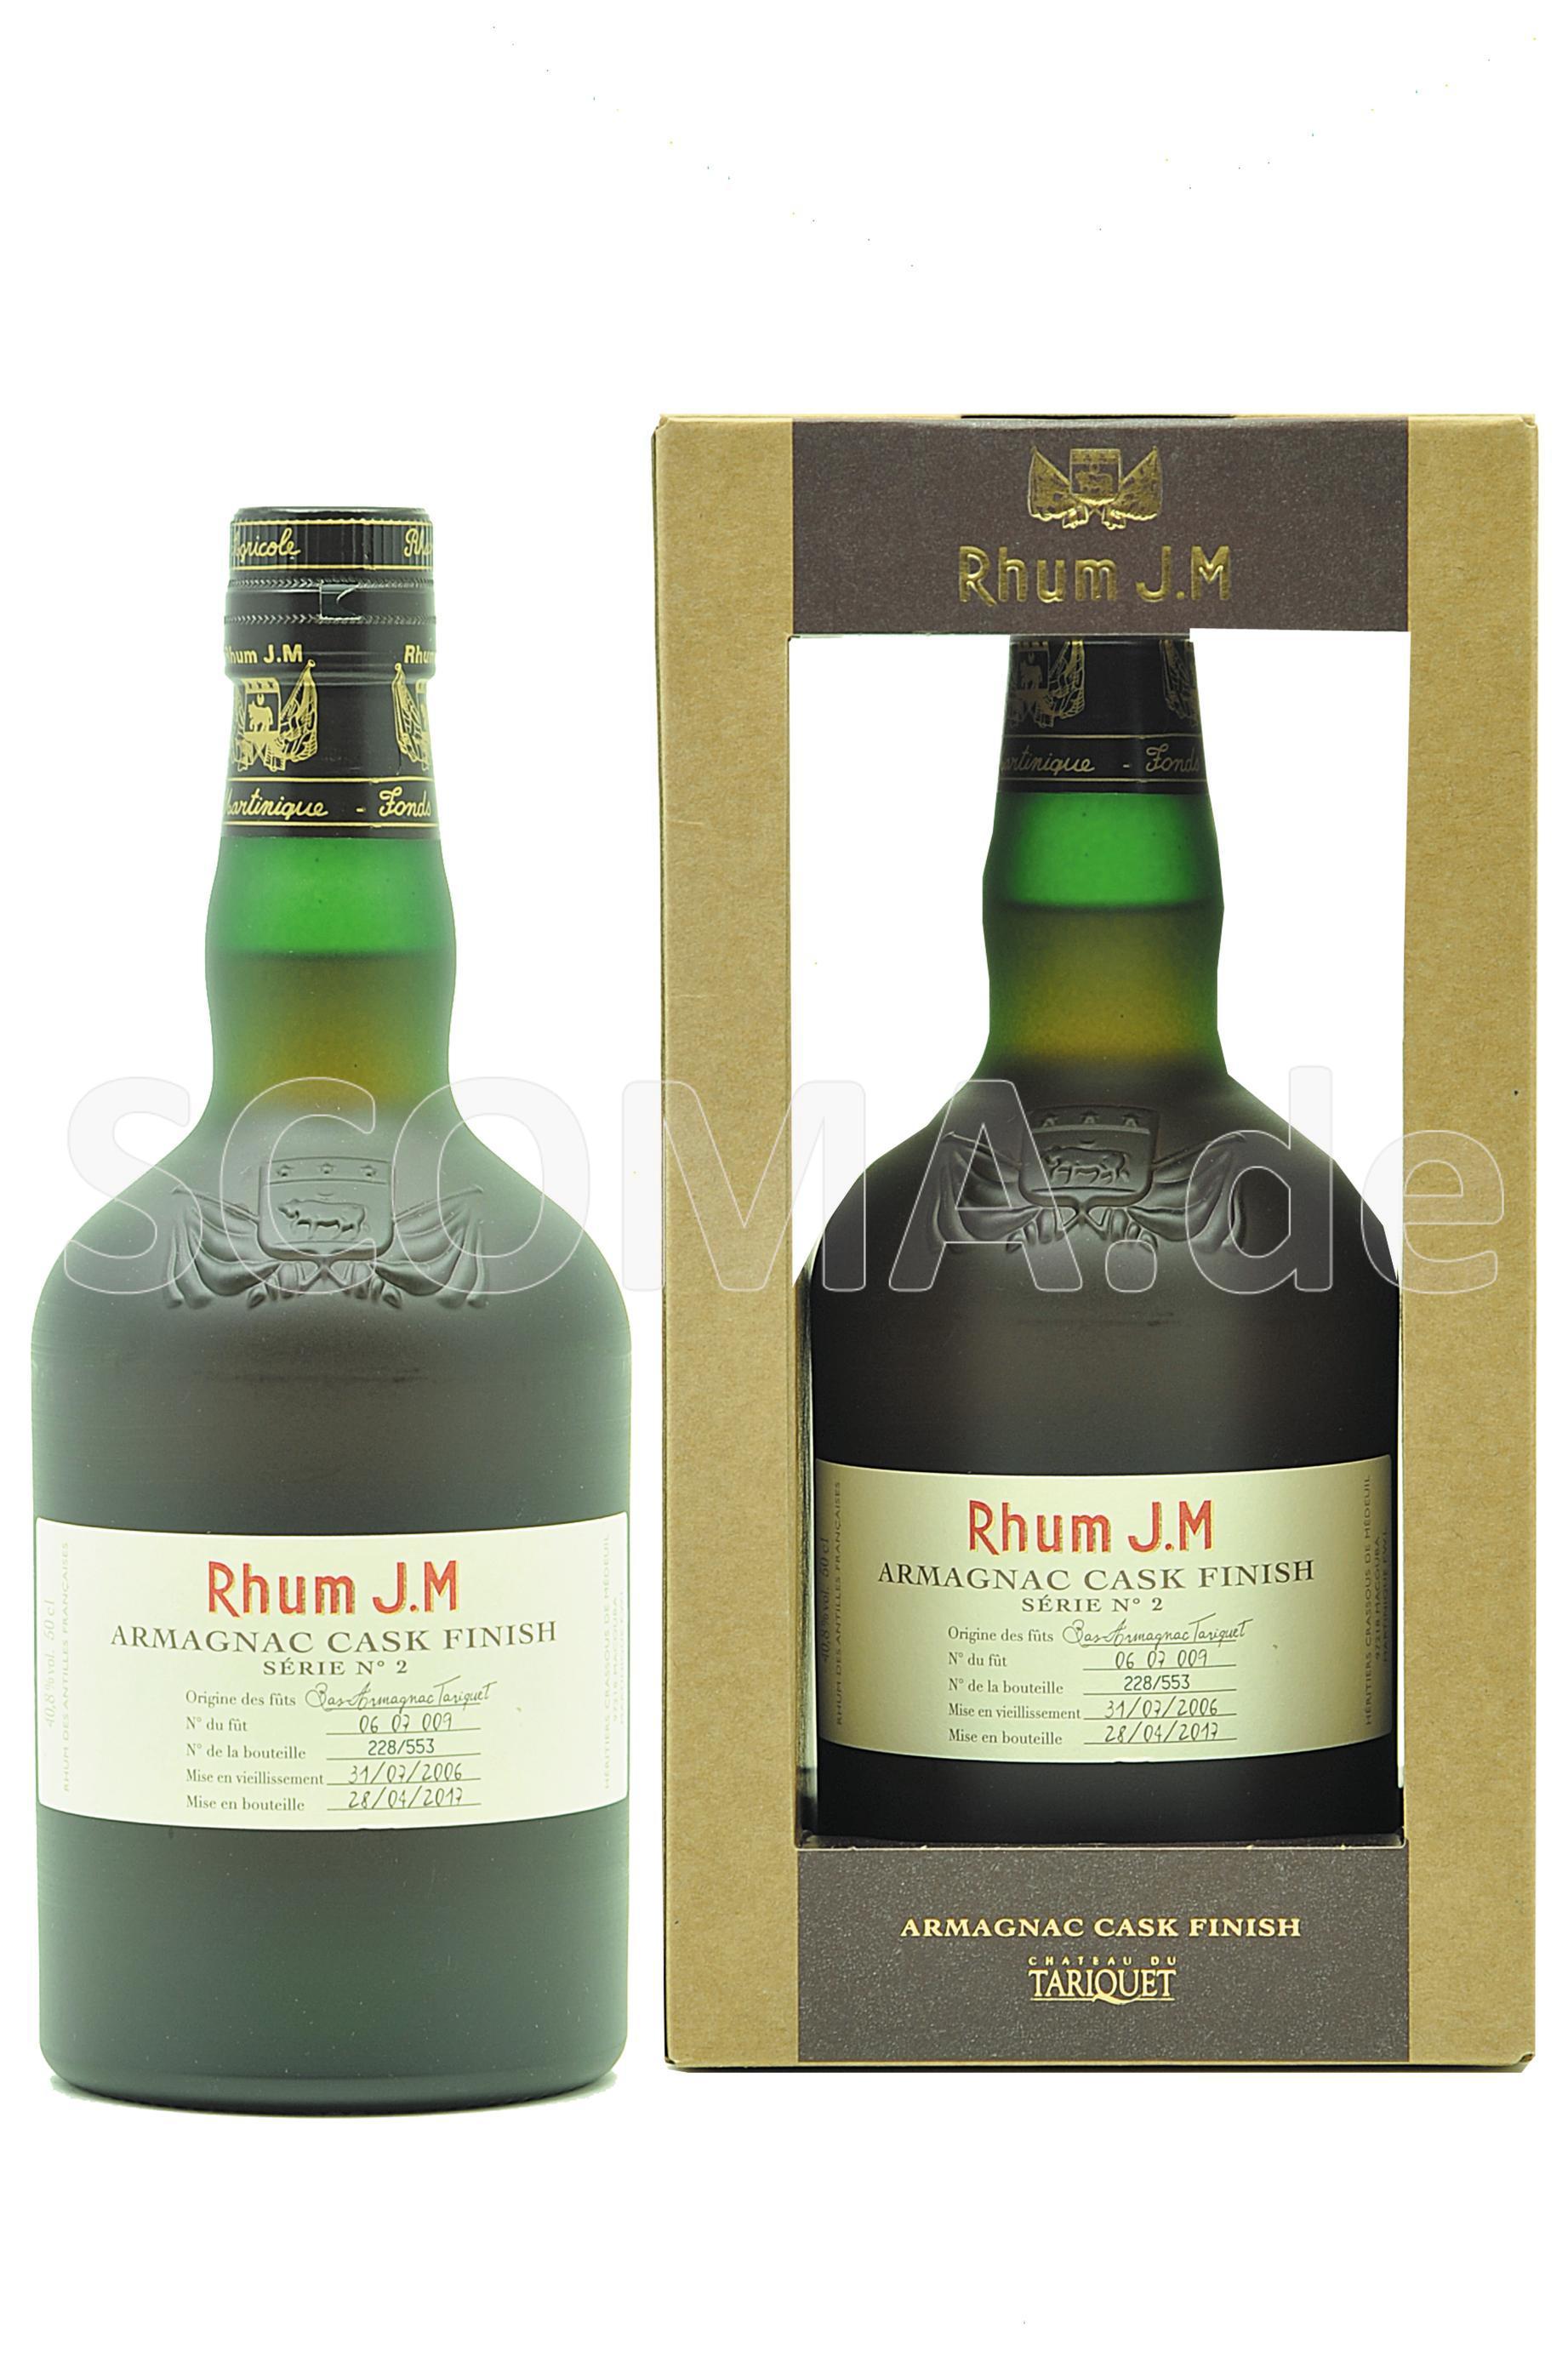 Rhum J.M. Cognac Cask Finish 2...